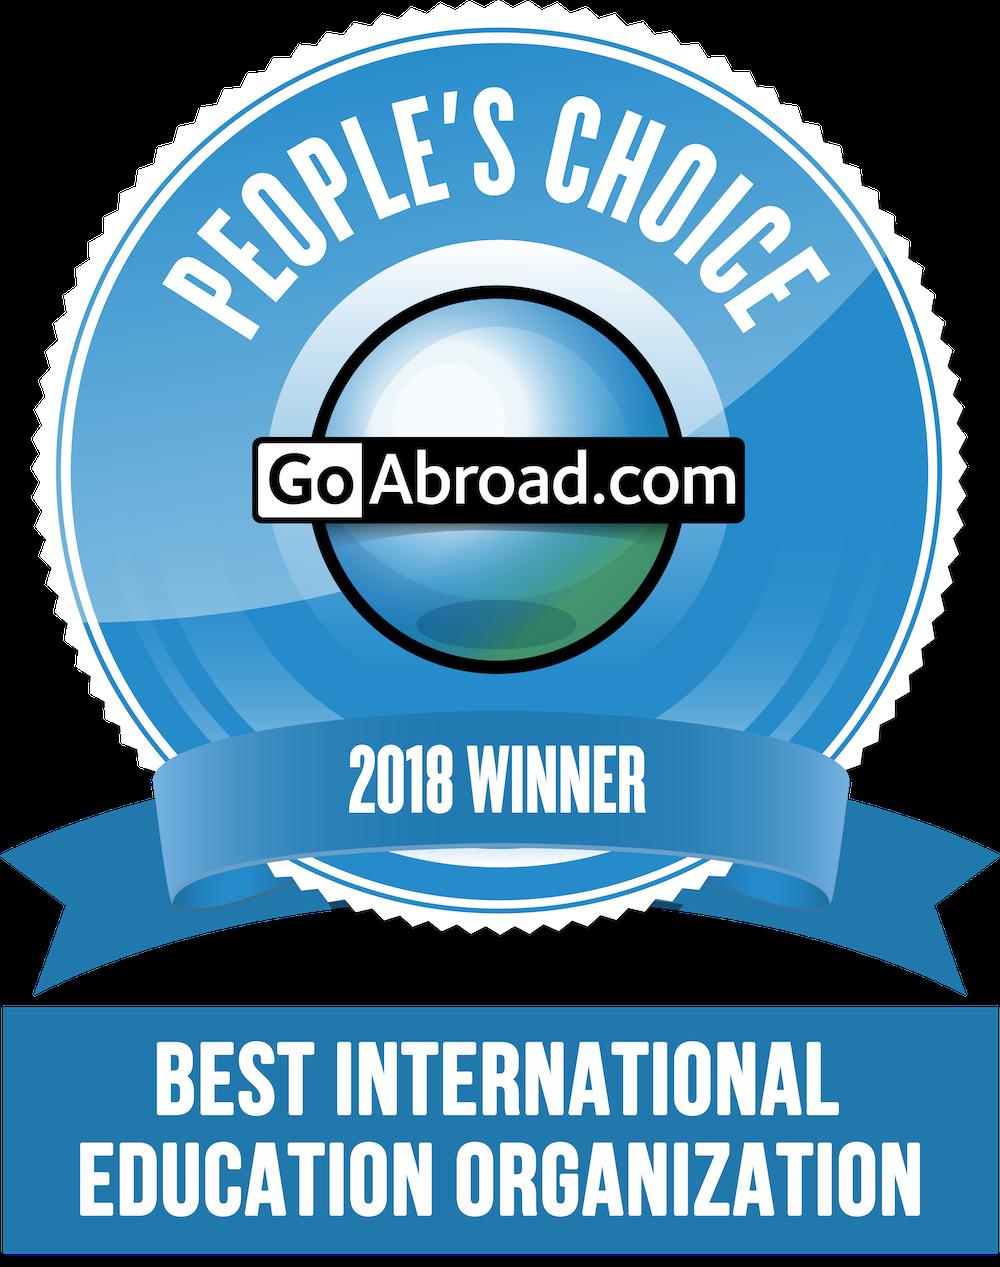 Best International Education Organization For TEFL Certification